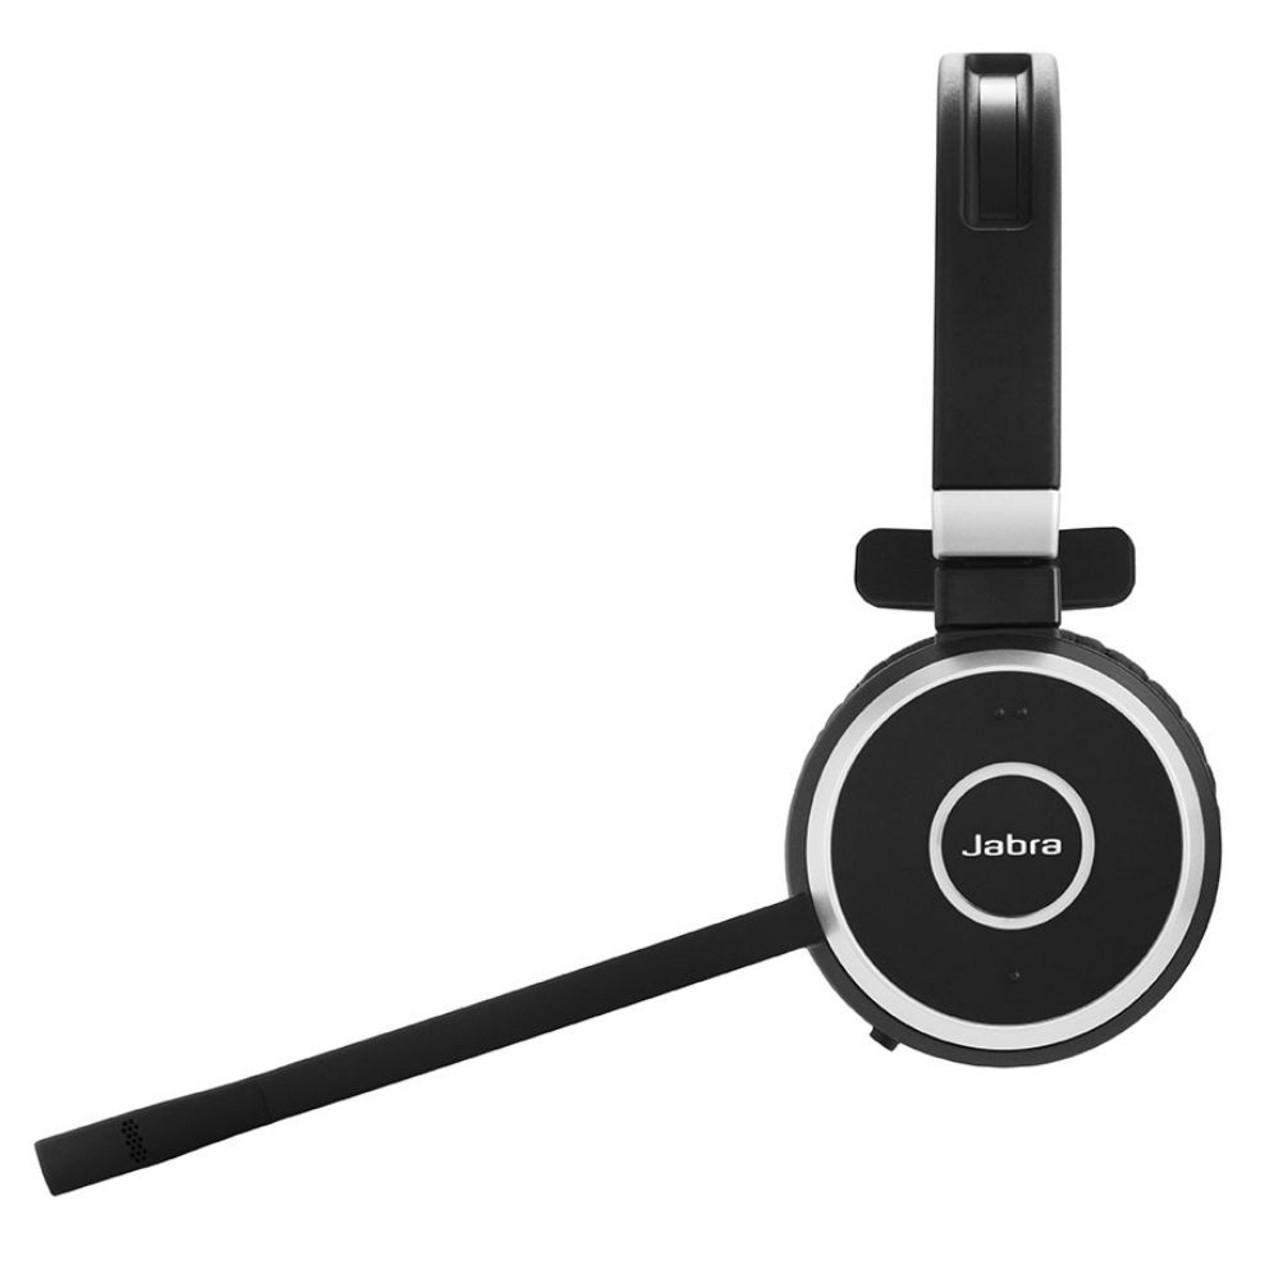 Jabra Singapore Jabra Evolve 65 Uc Stereo Wireless Headset With Charging Stand Usb Adapter